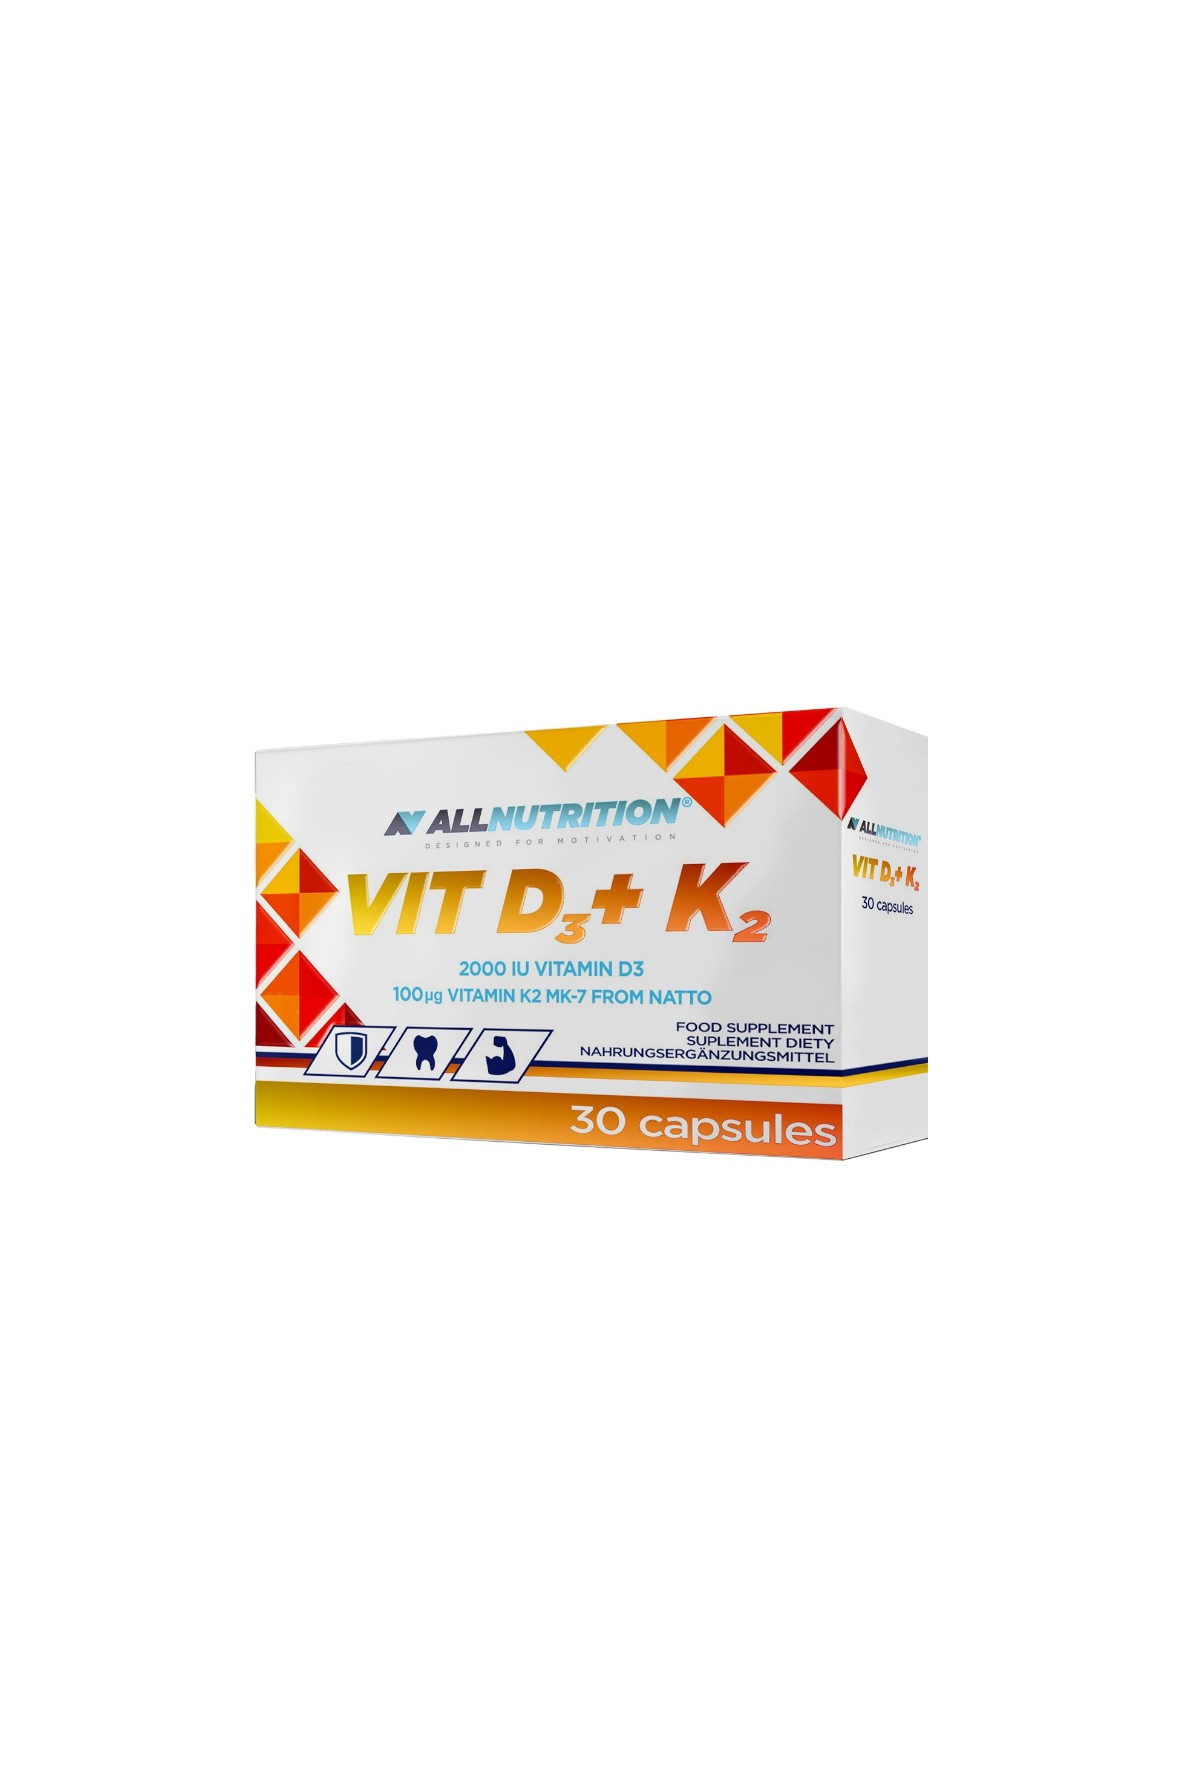 Suplementy diety - Allnutrition  Witamina D3 + K2 - 30 kapsułek